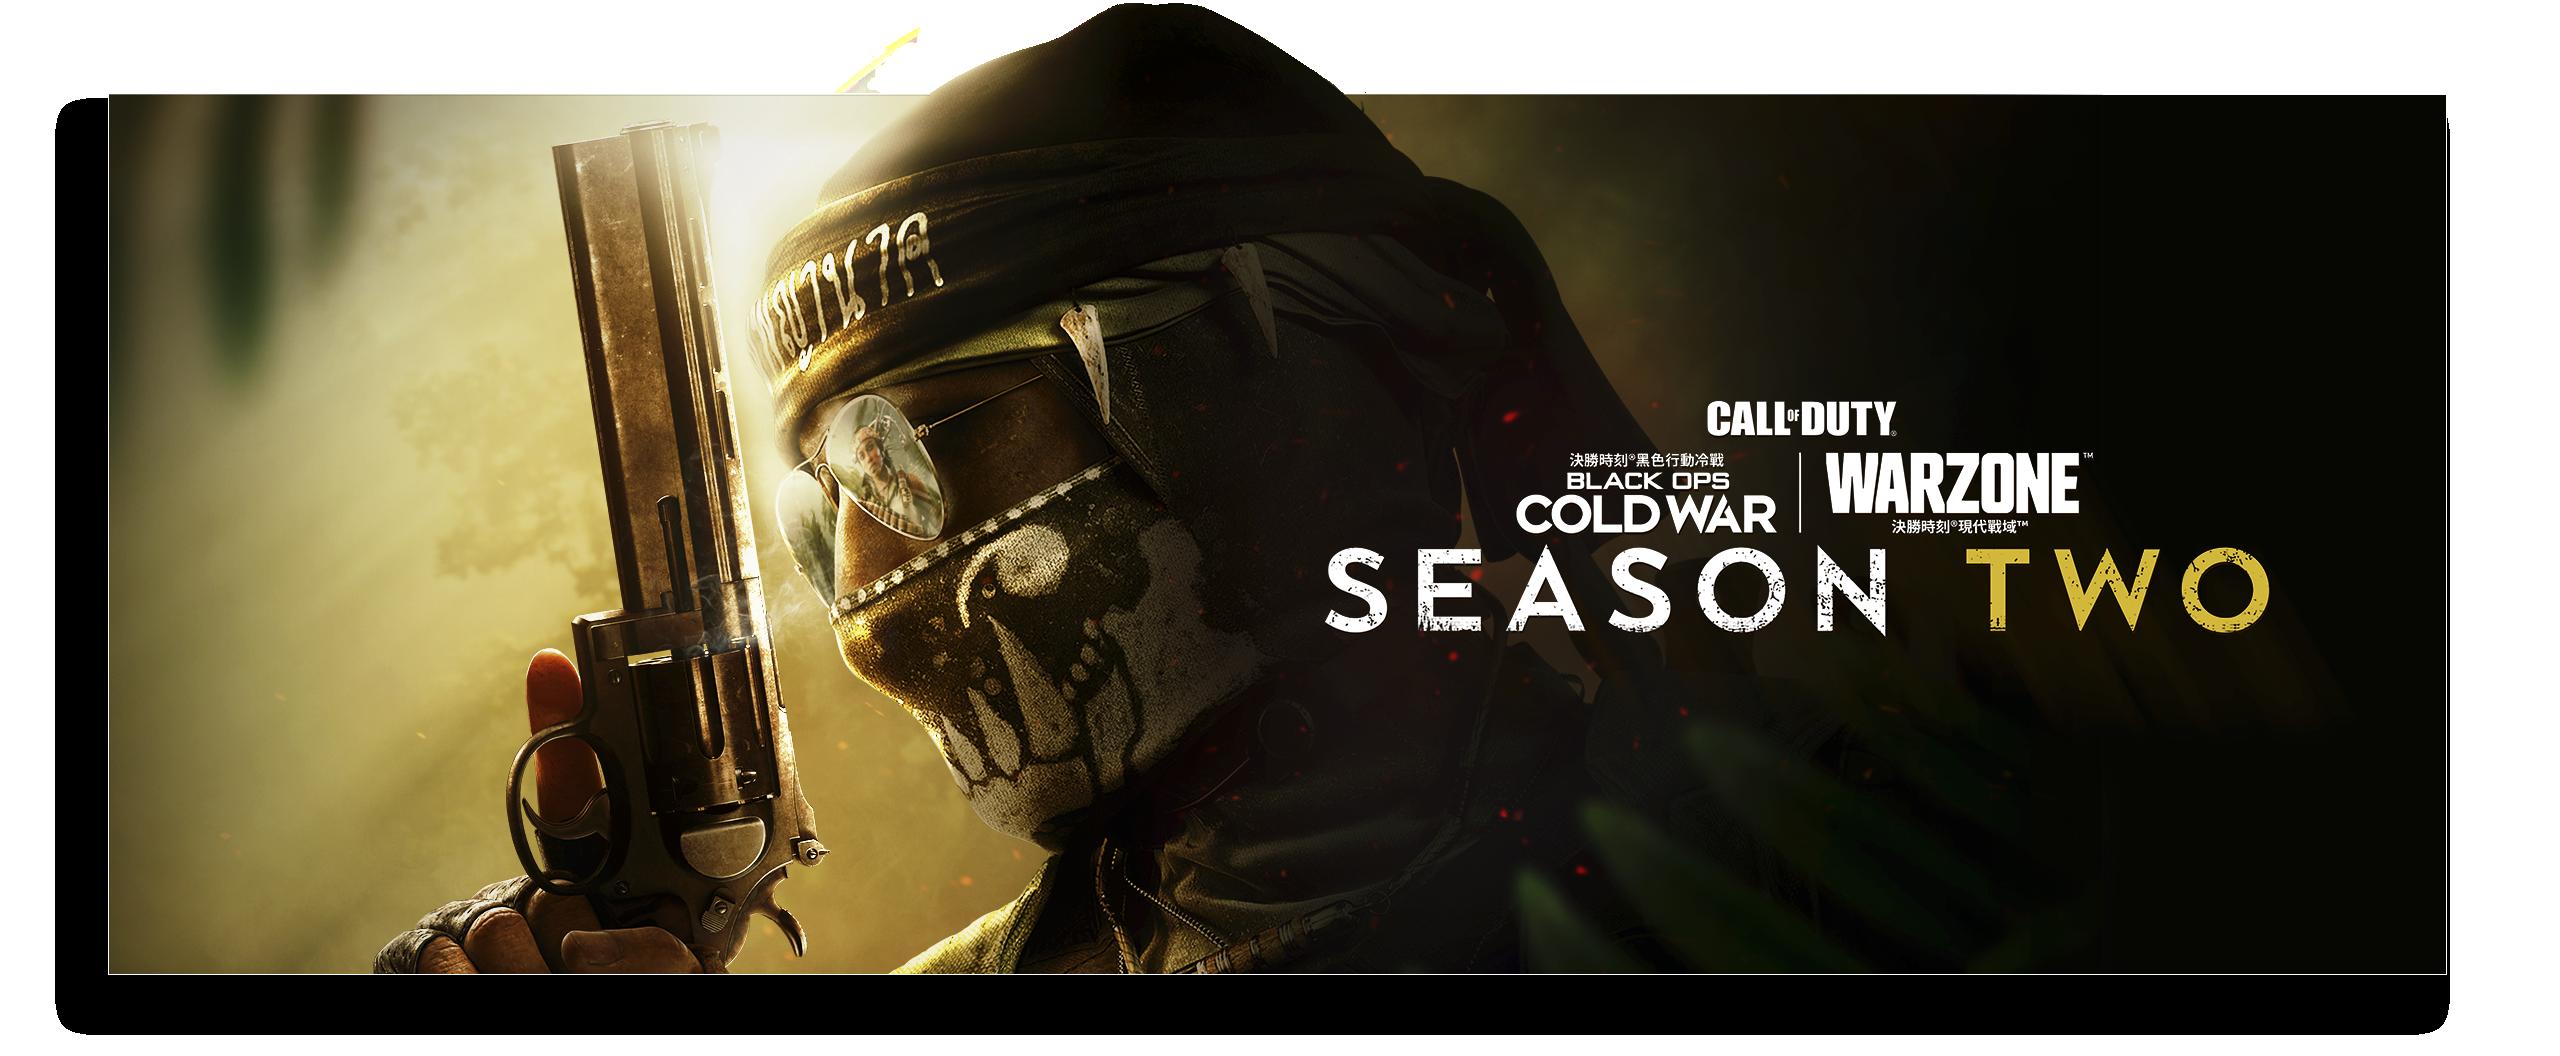 Call of Duty Black Ops Cold War Season 2 image